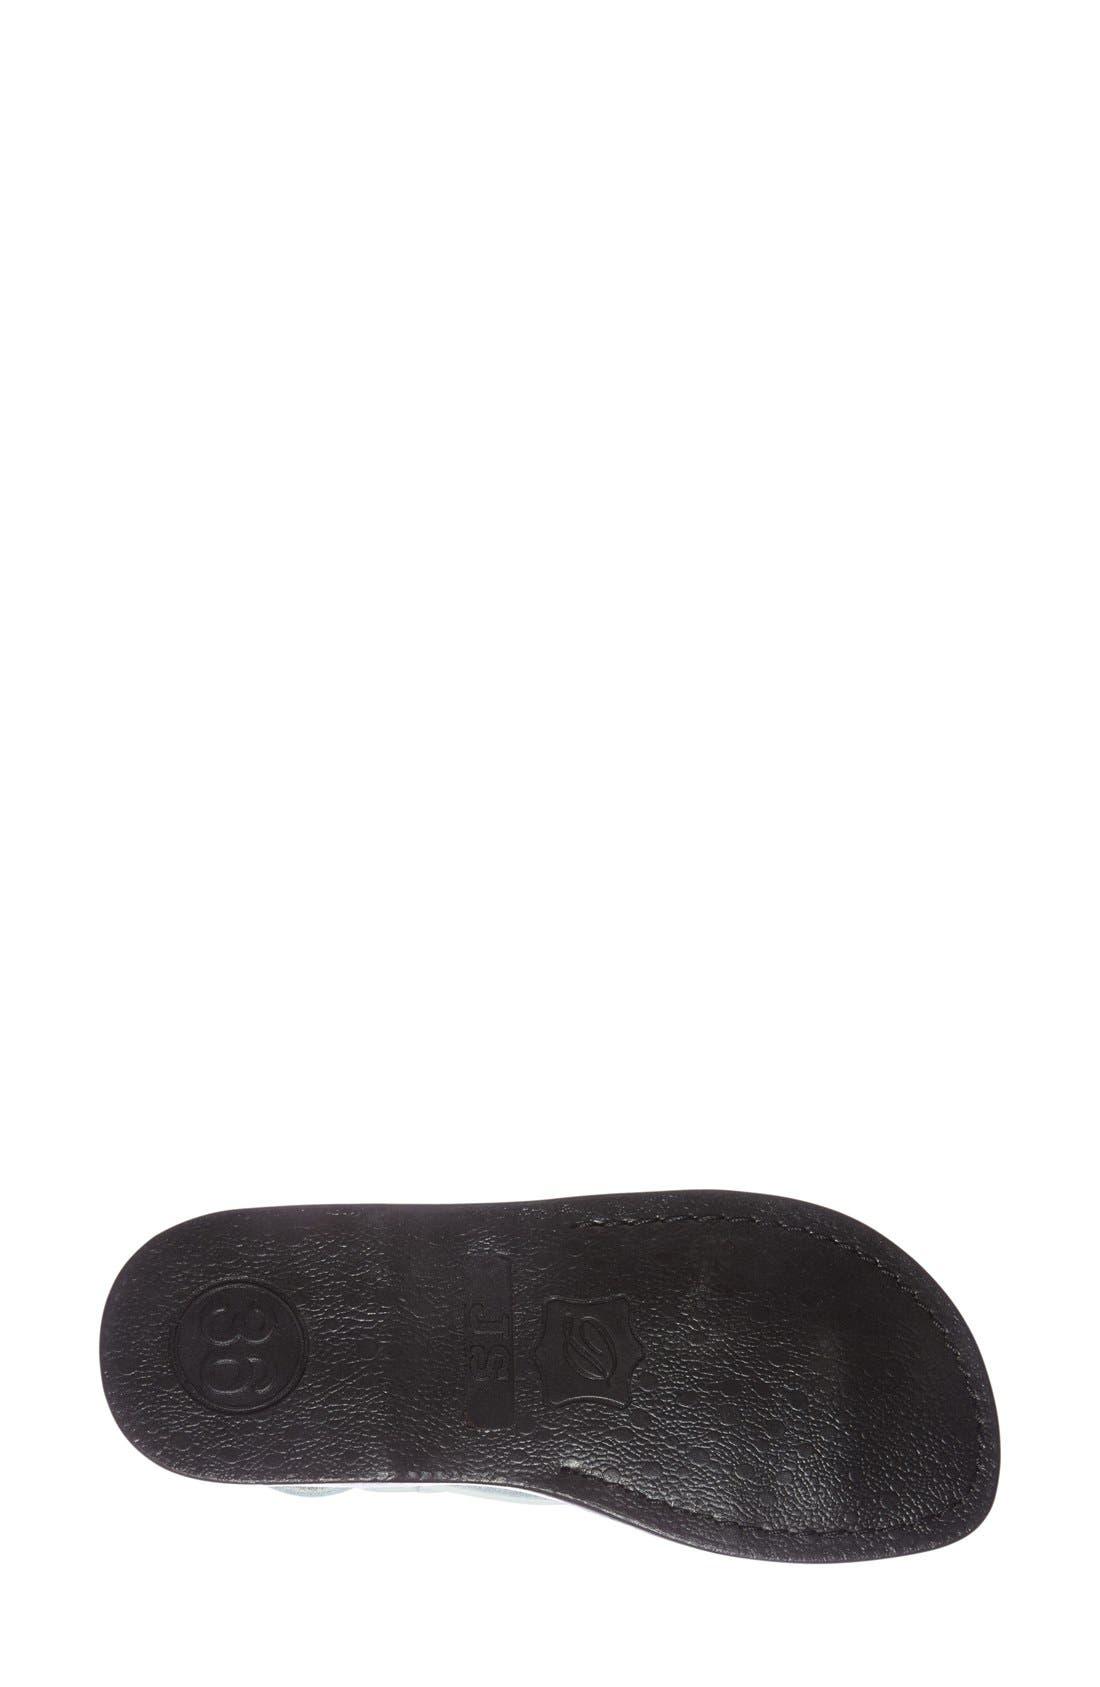 'Tamar' Strappy Sandal,                             Alternate thumbnail 4, color,                             White Leather